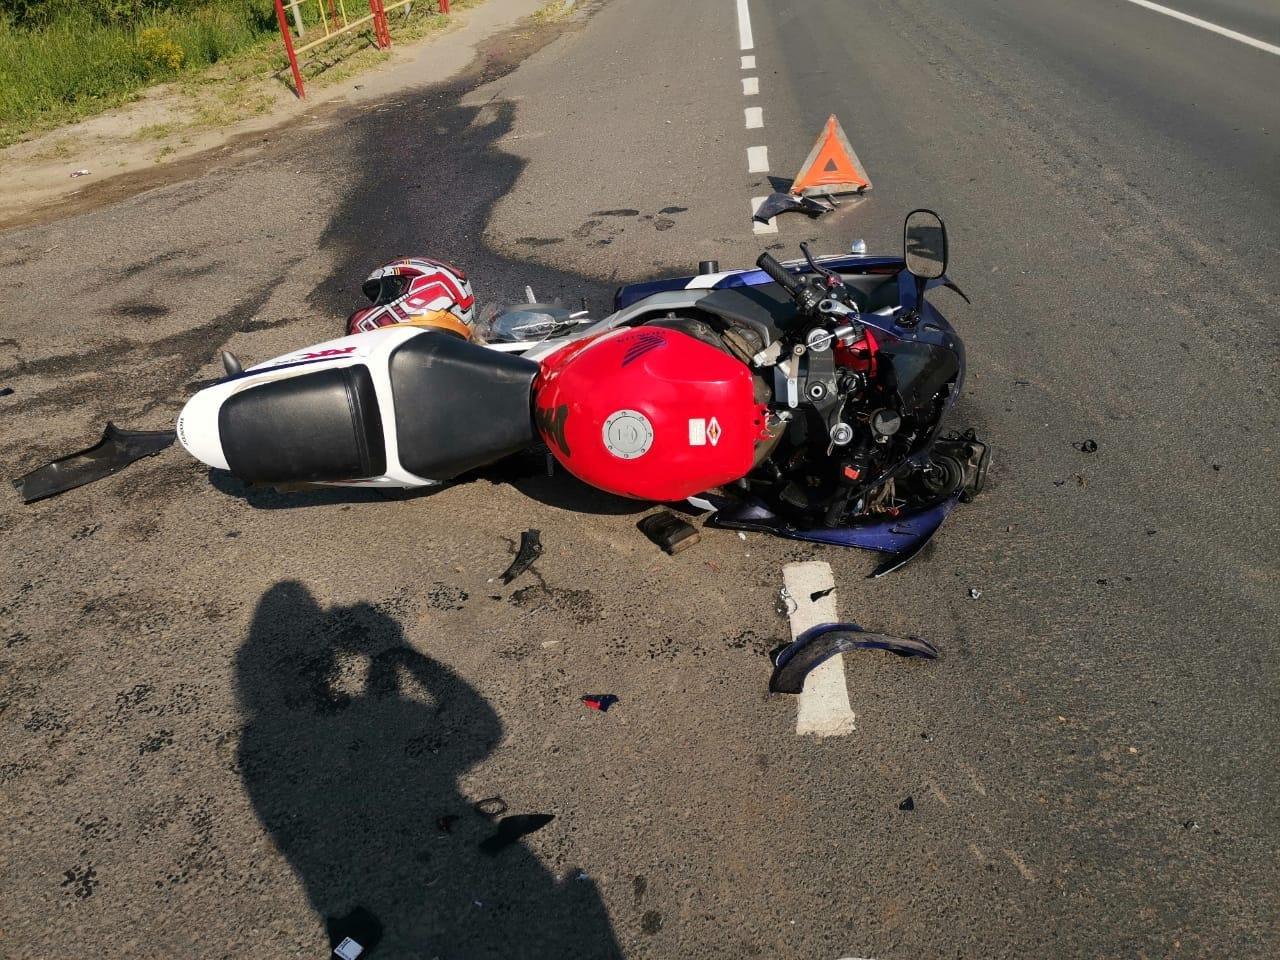 В Тамбовском районе мотоциклист без прав протаранил легковушку, фото-2